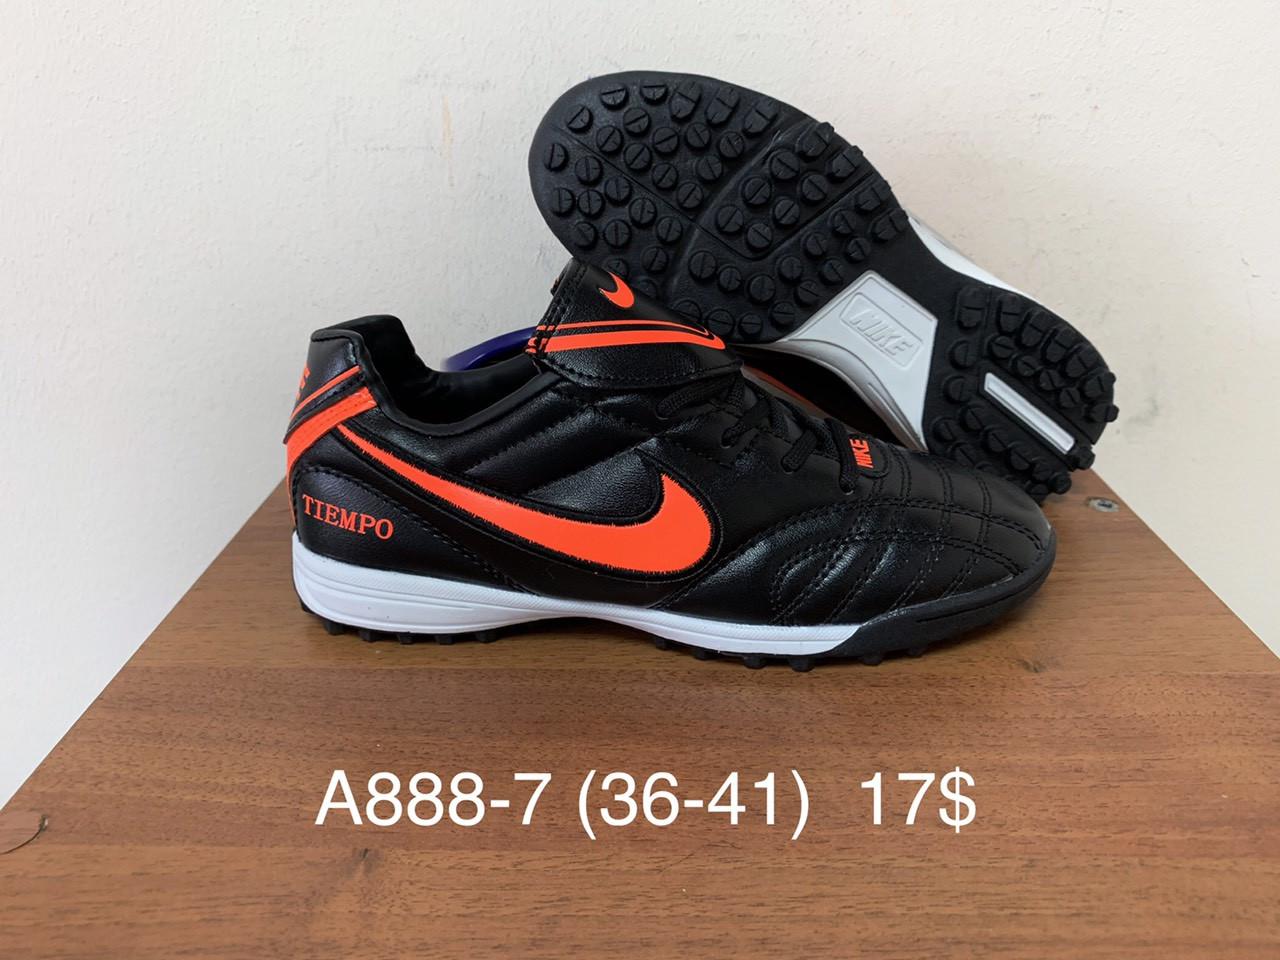 Подростковые сороконожки Nike Tiempo оптом (36-41)